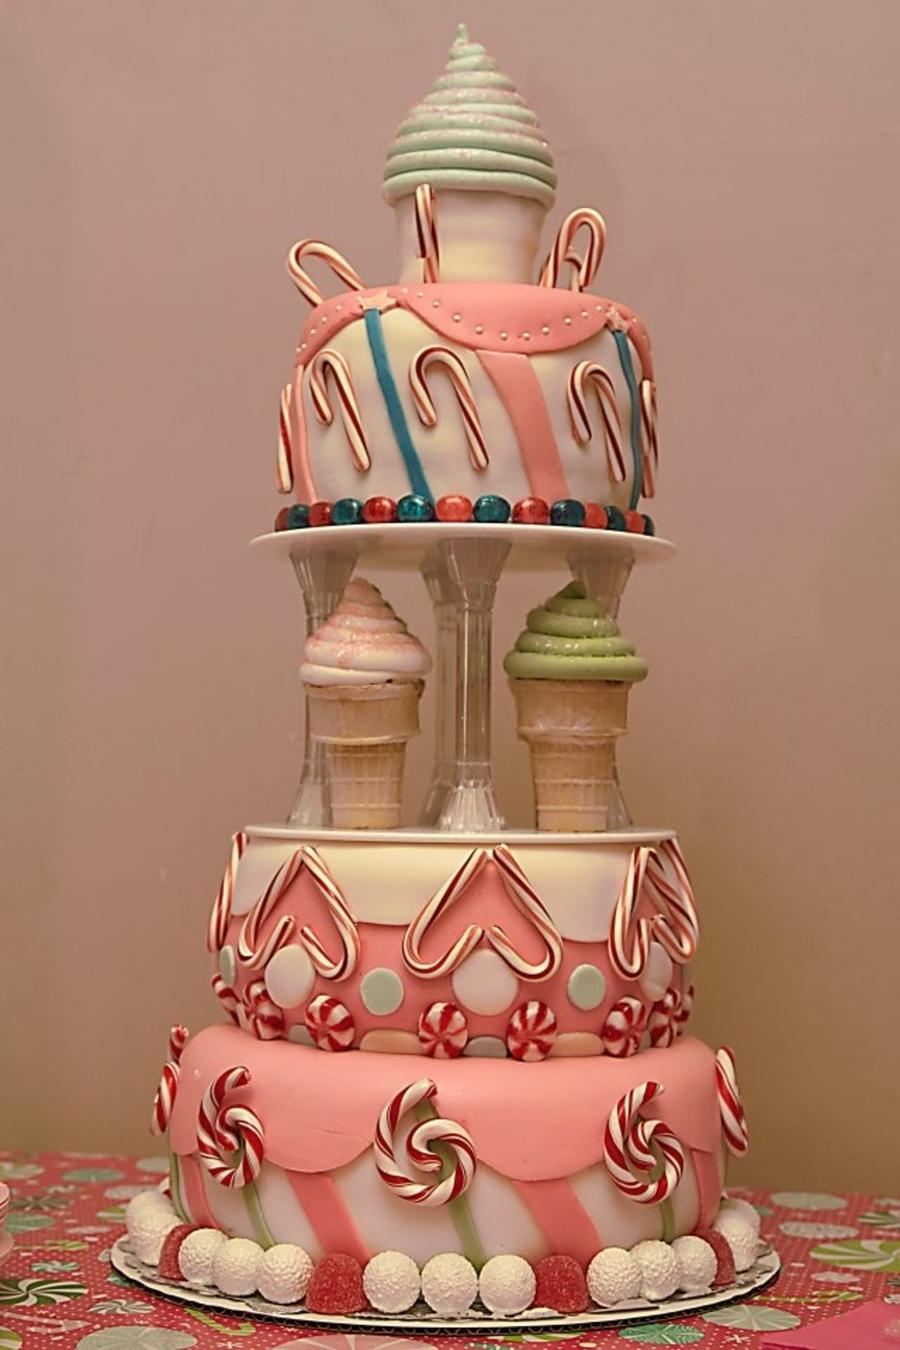 Candy Land Cake - CakeCentral.com